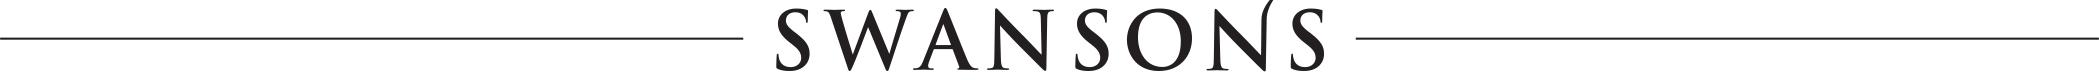 Swansons Headline.jpg